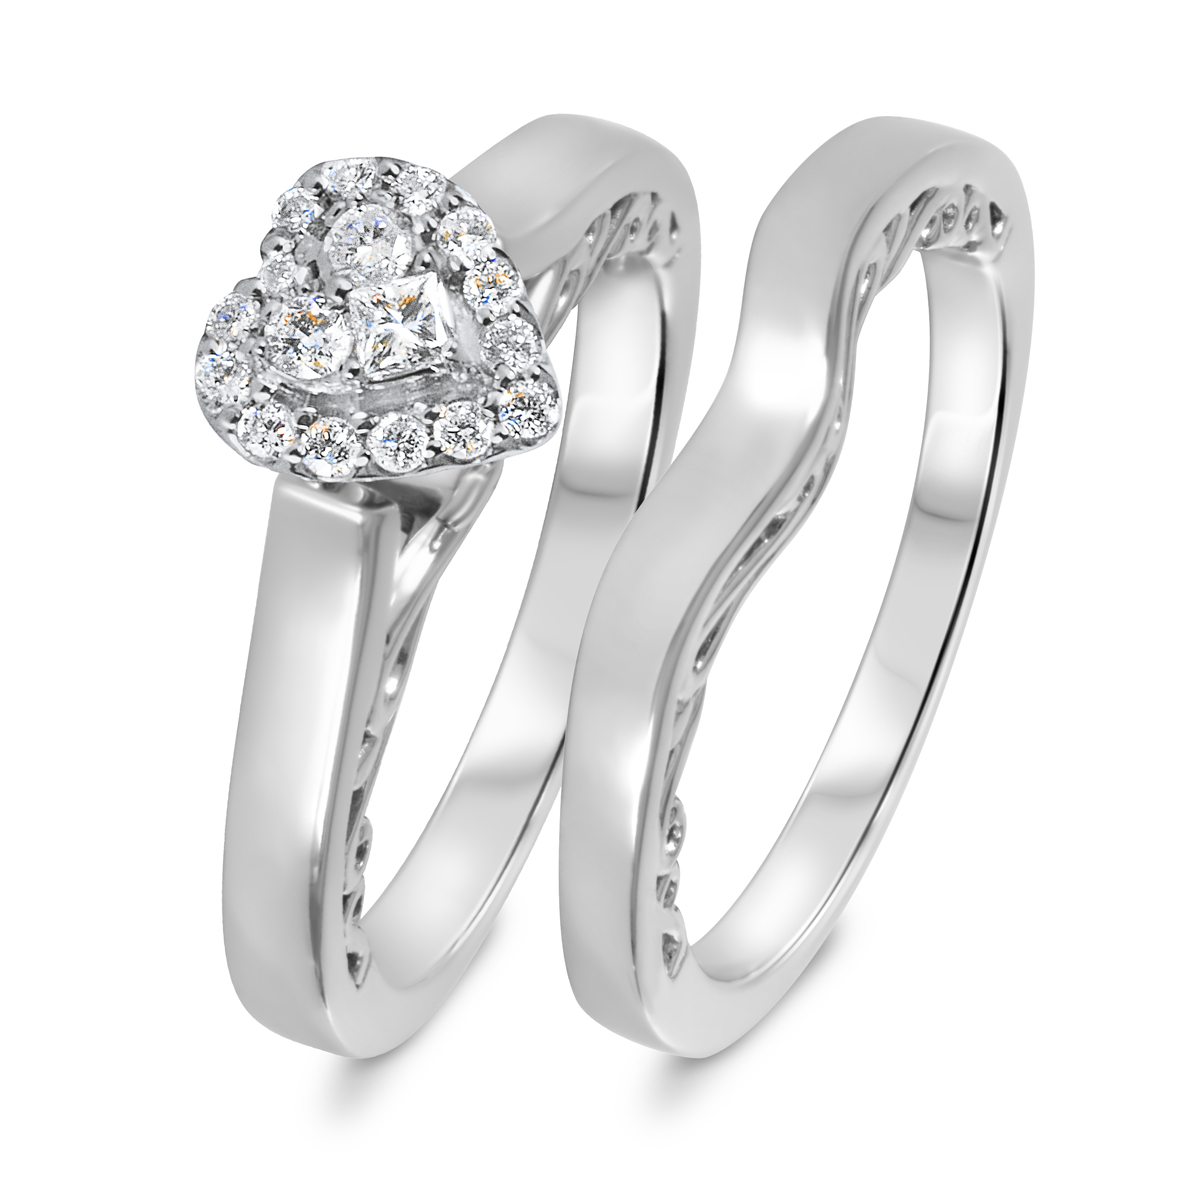 1/4 CT. T.W. Diamond Women's Bridal Wedding Ring Set 10K White Gold